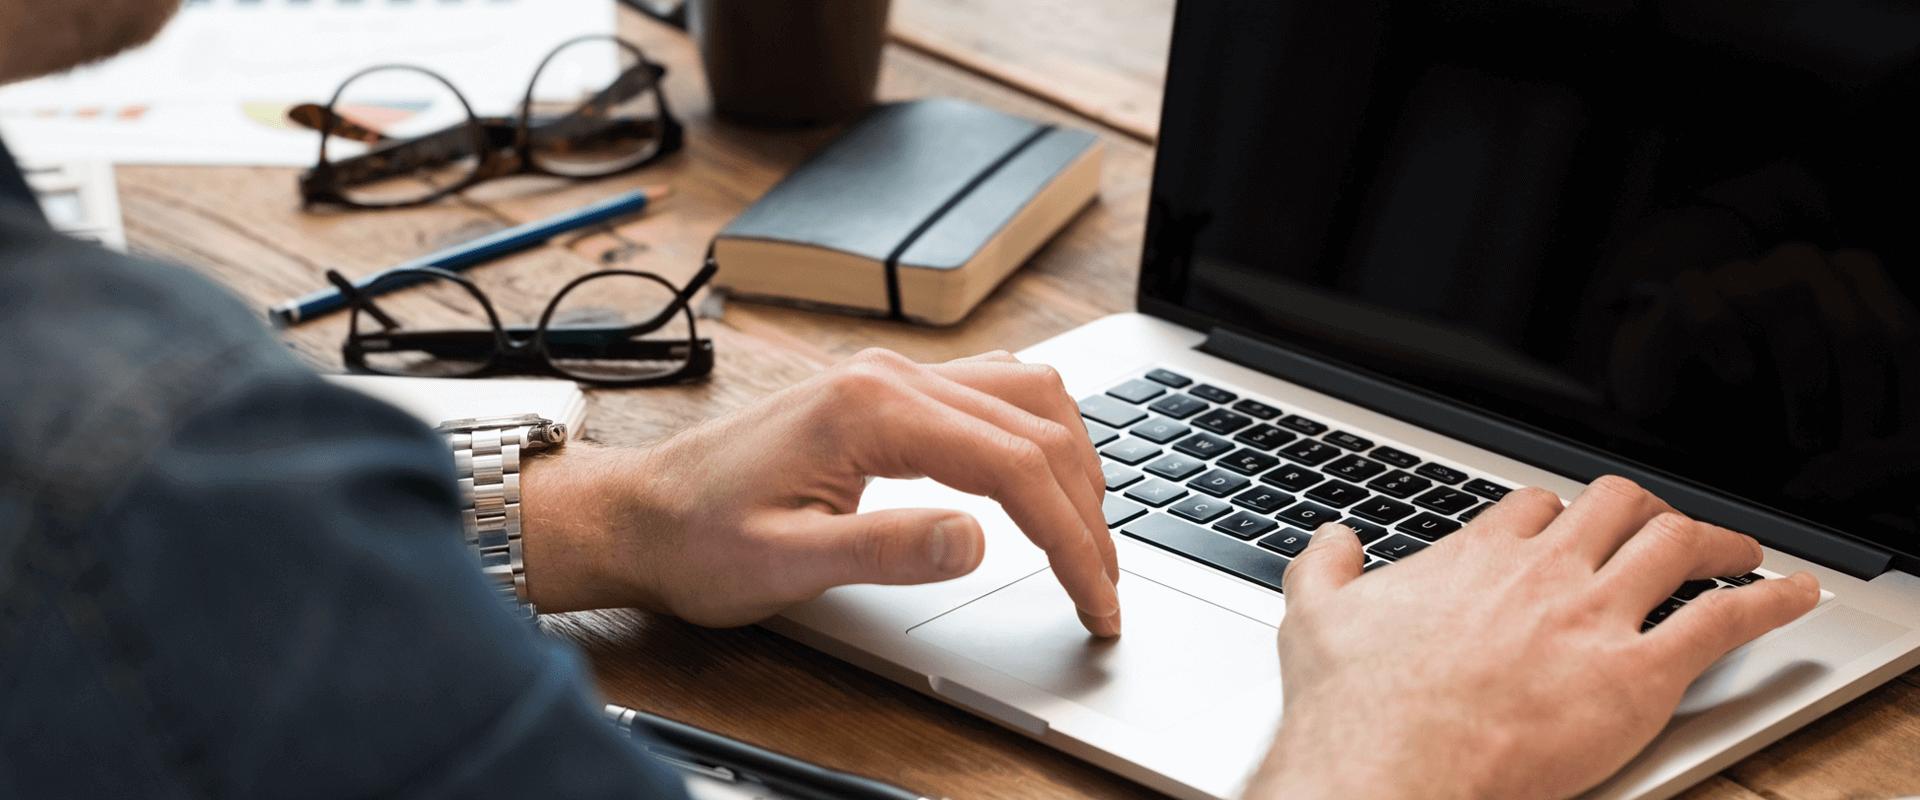 Content Management System (CMS): τι είναι και ποιες είναι οι λειτουργίες του;